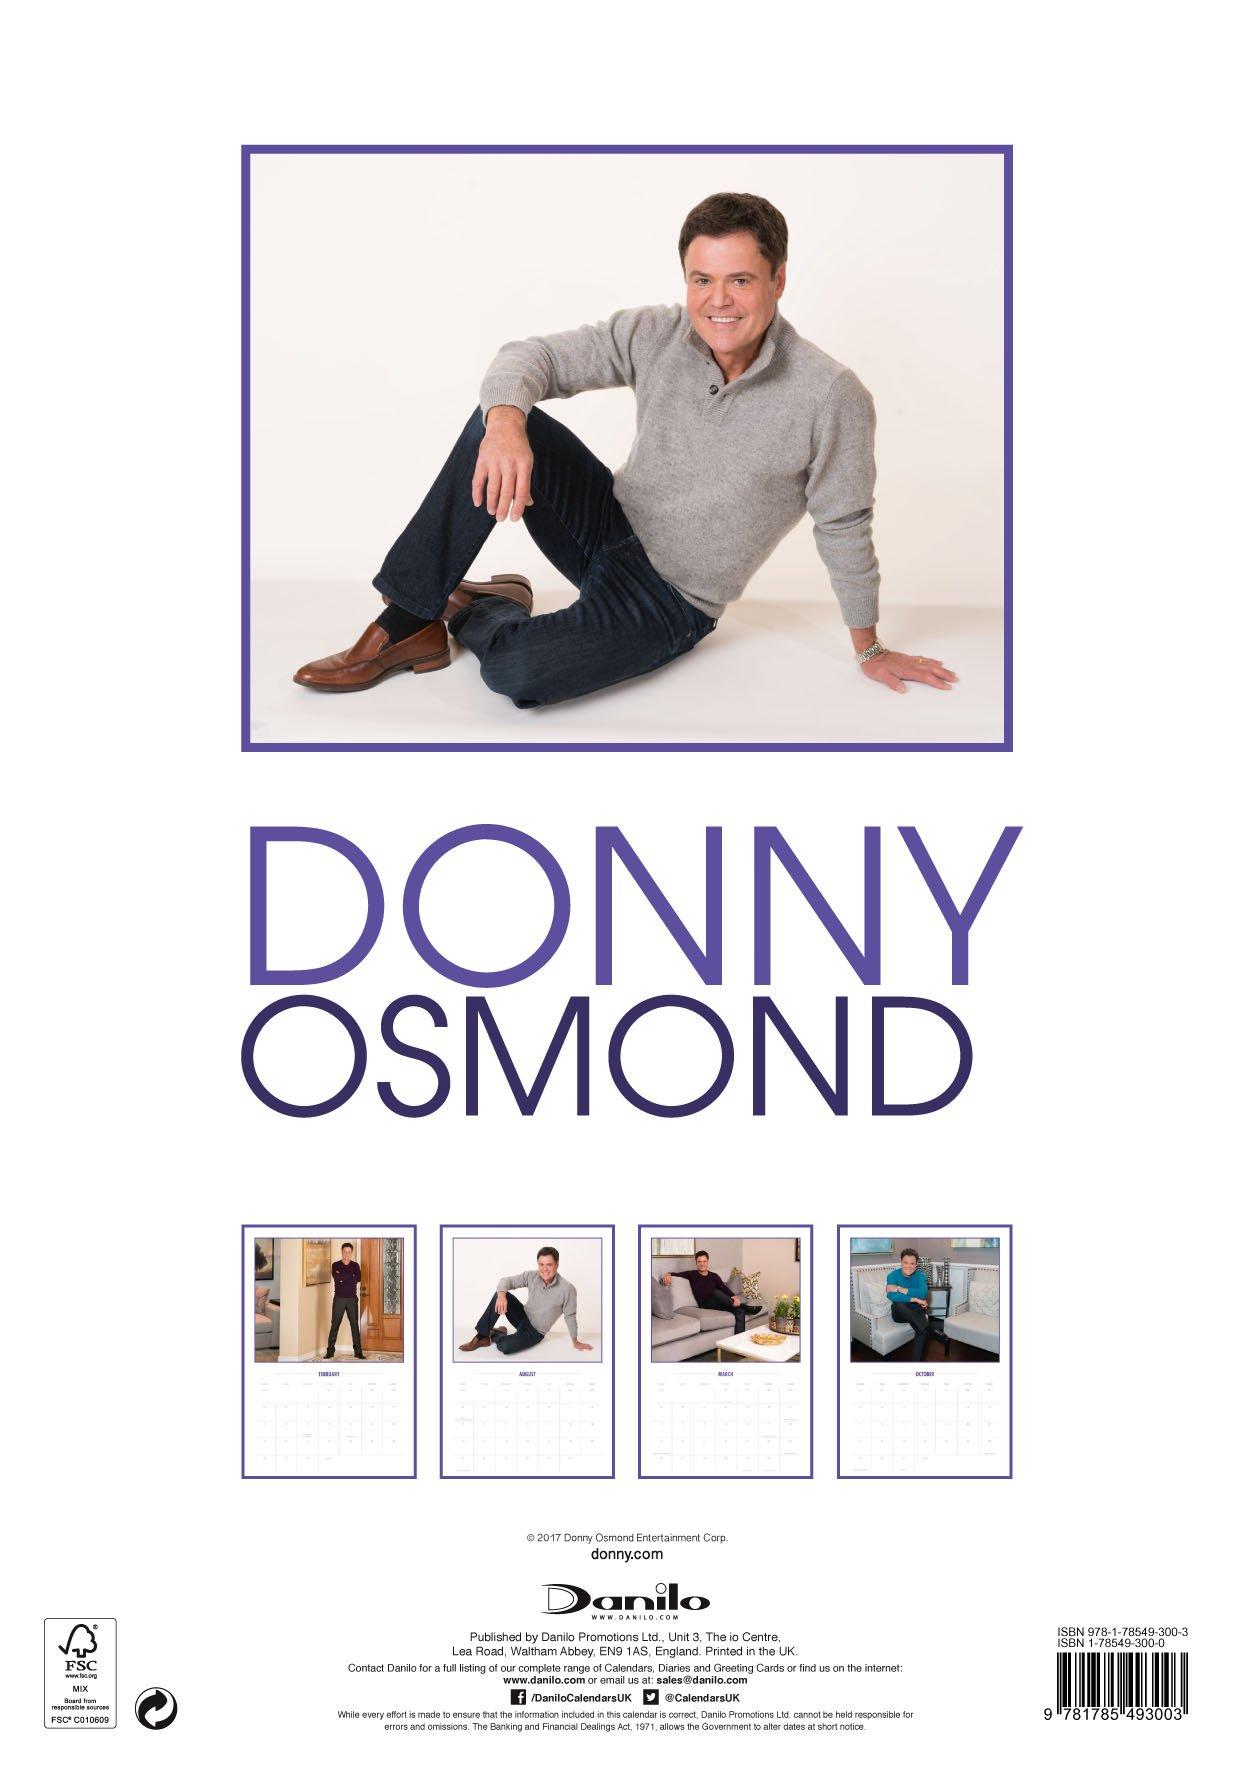 Donny Osmond Official 2018 Calendar